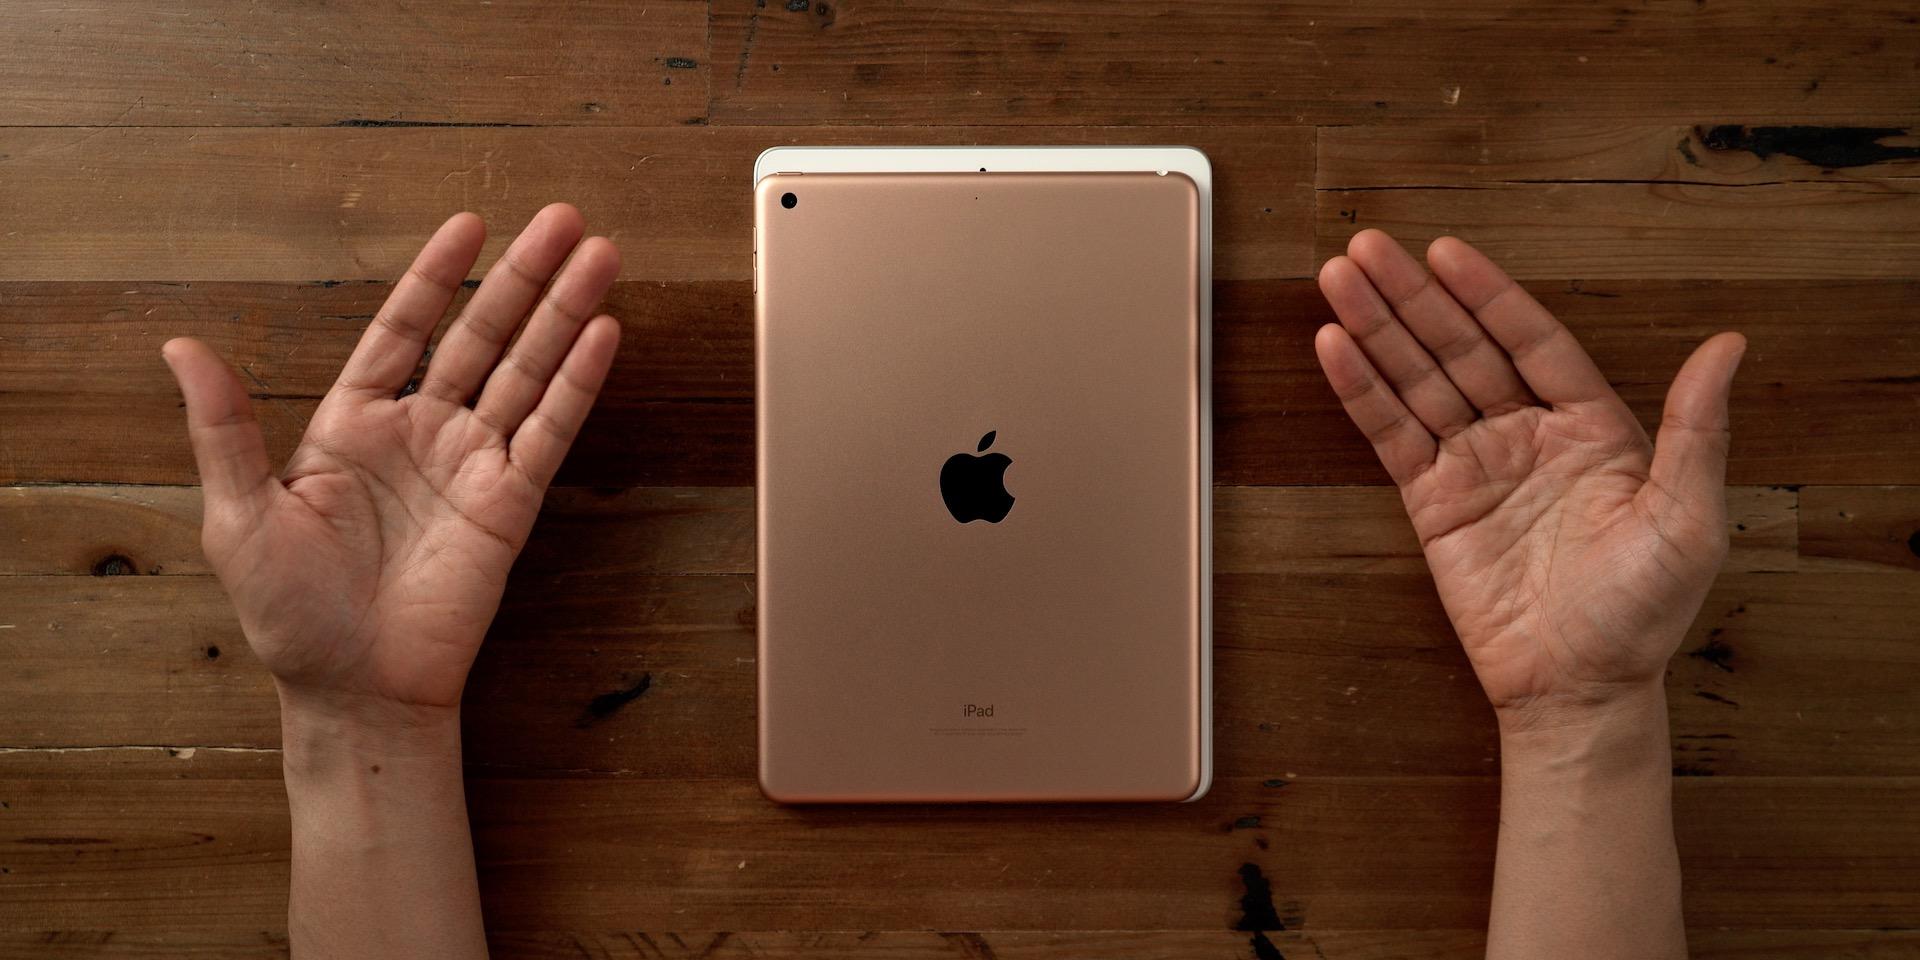 iPad rear